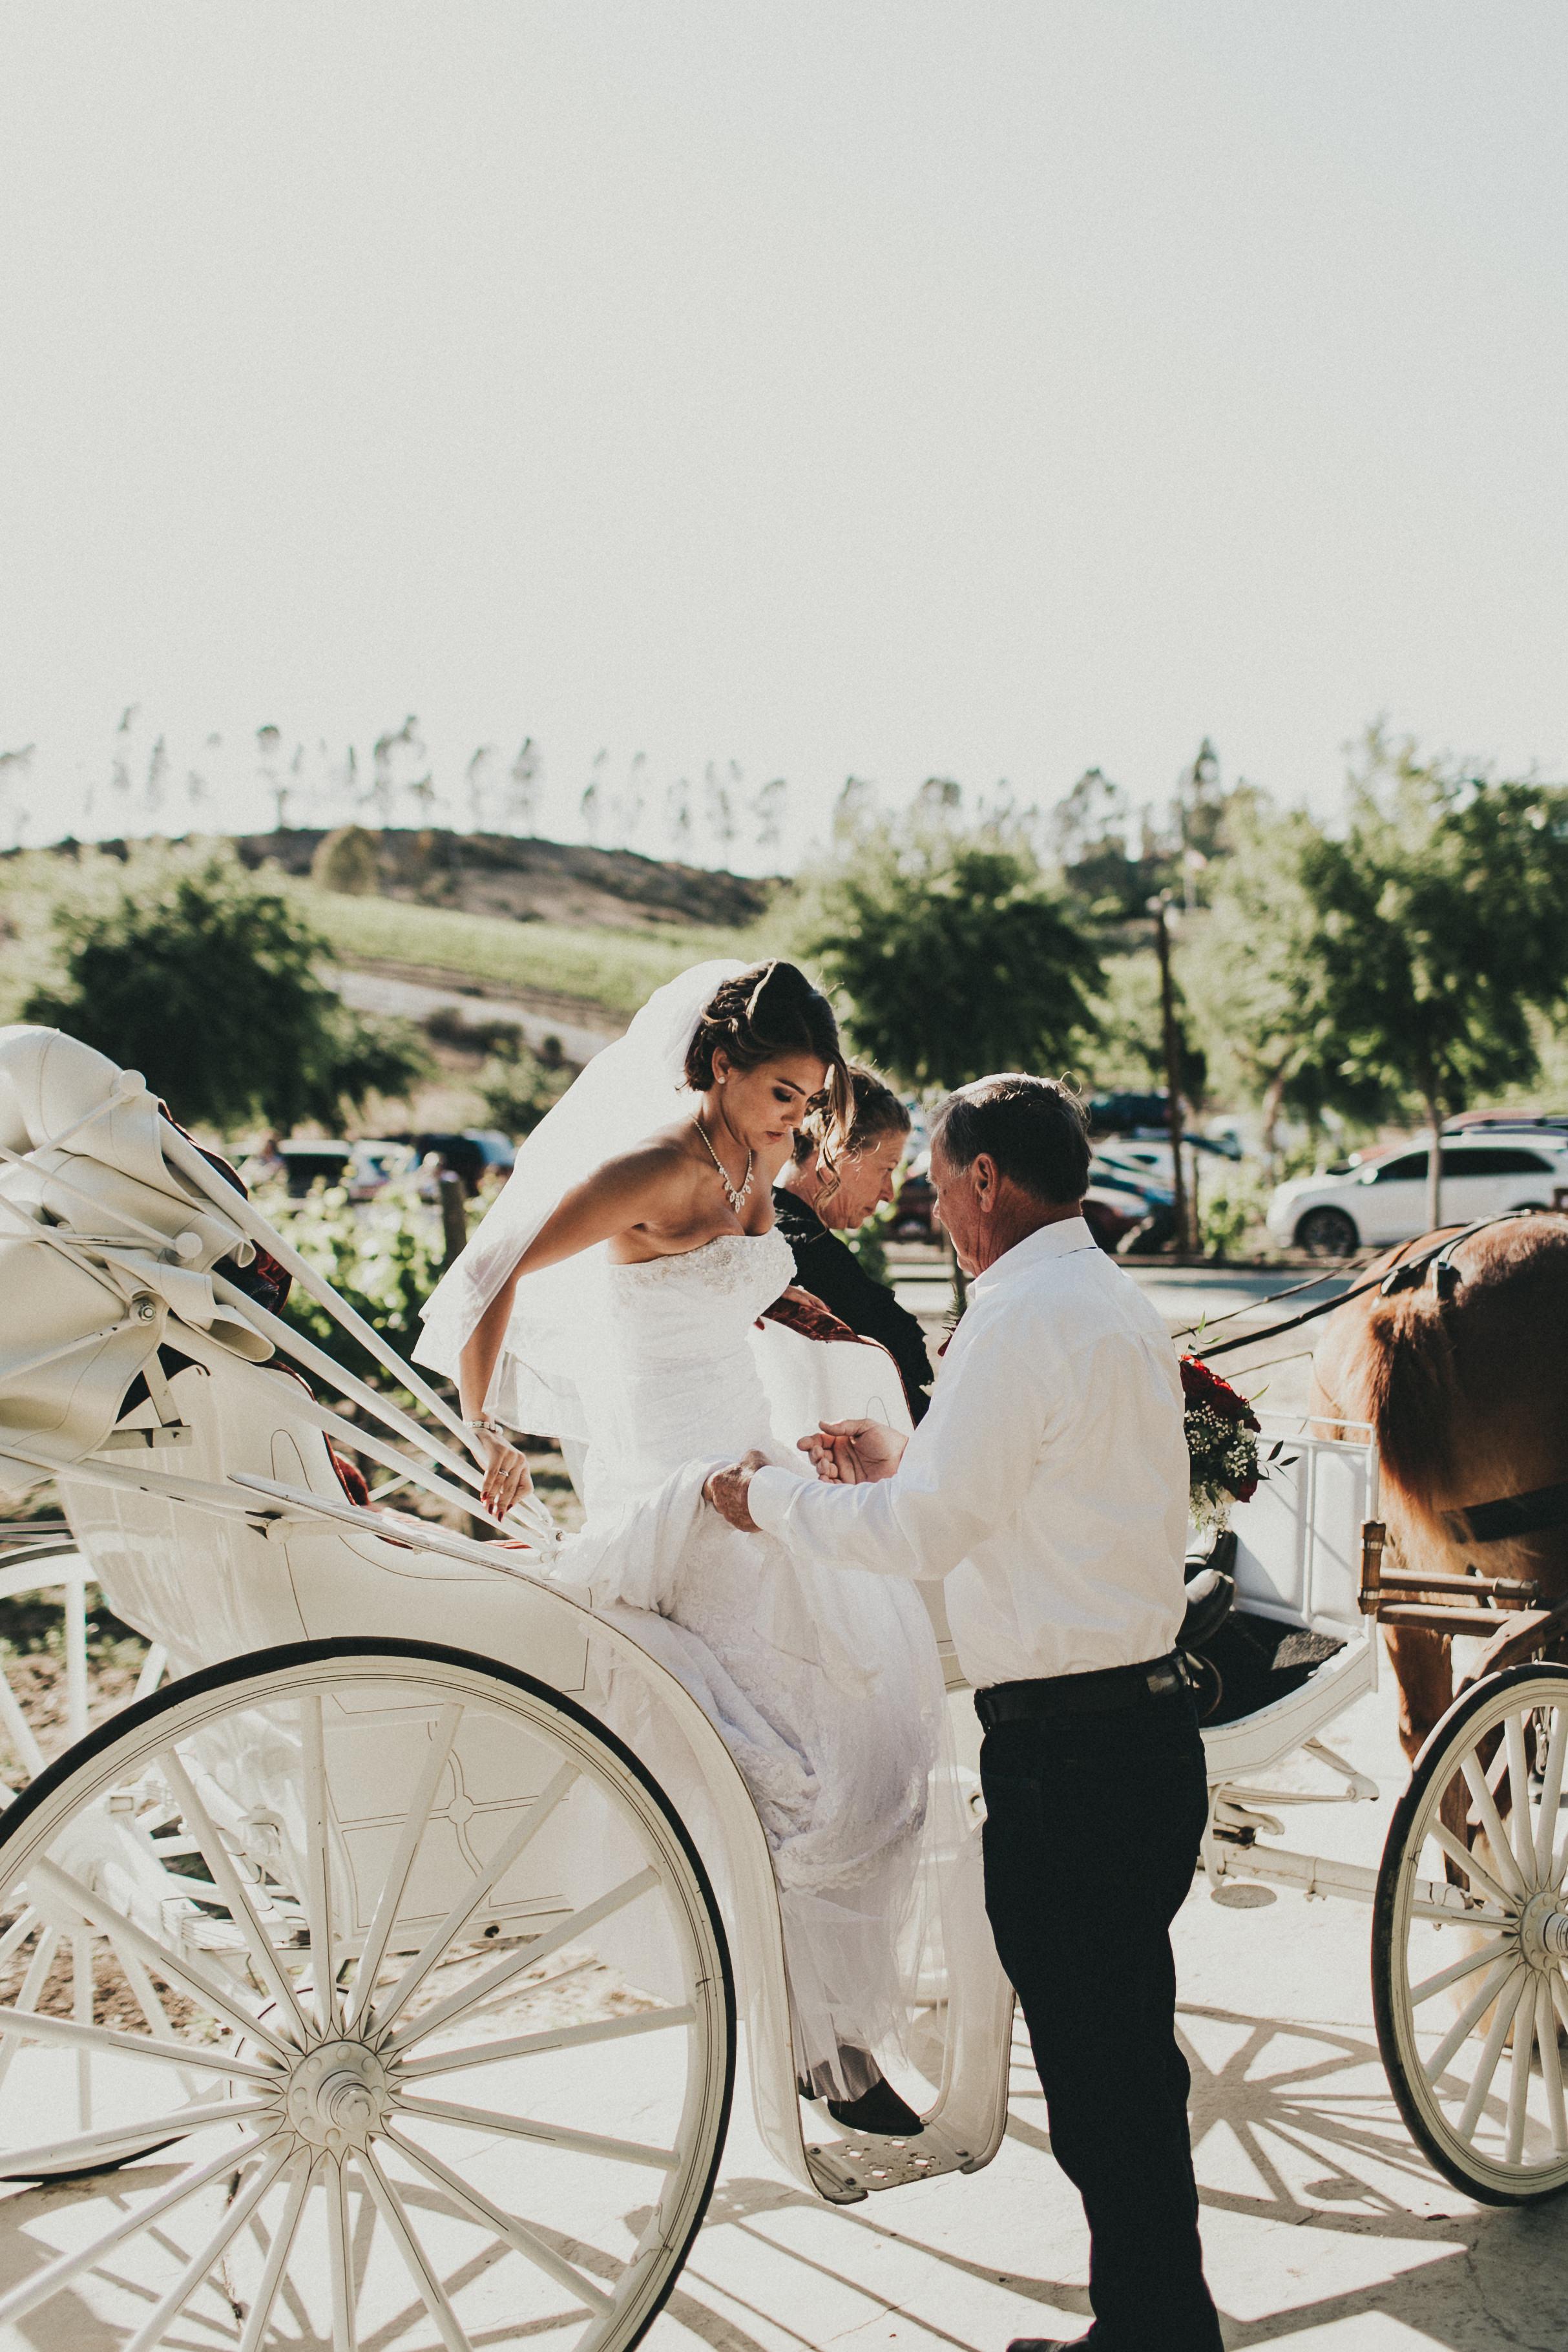 Cheyenne + Jordan - Wedding, Natalie Griffo (45 of 157).jpg